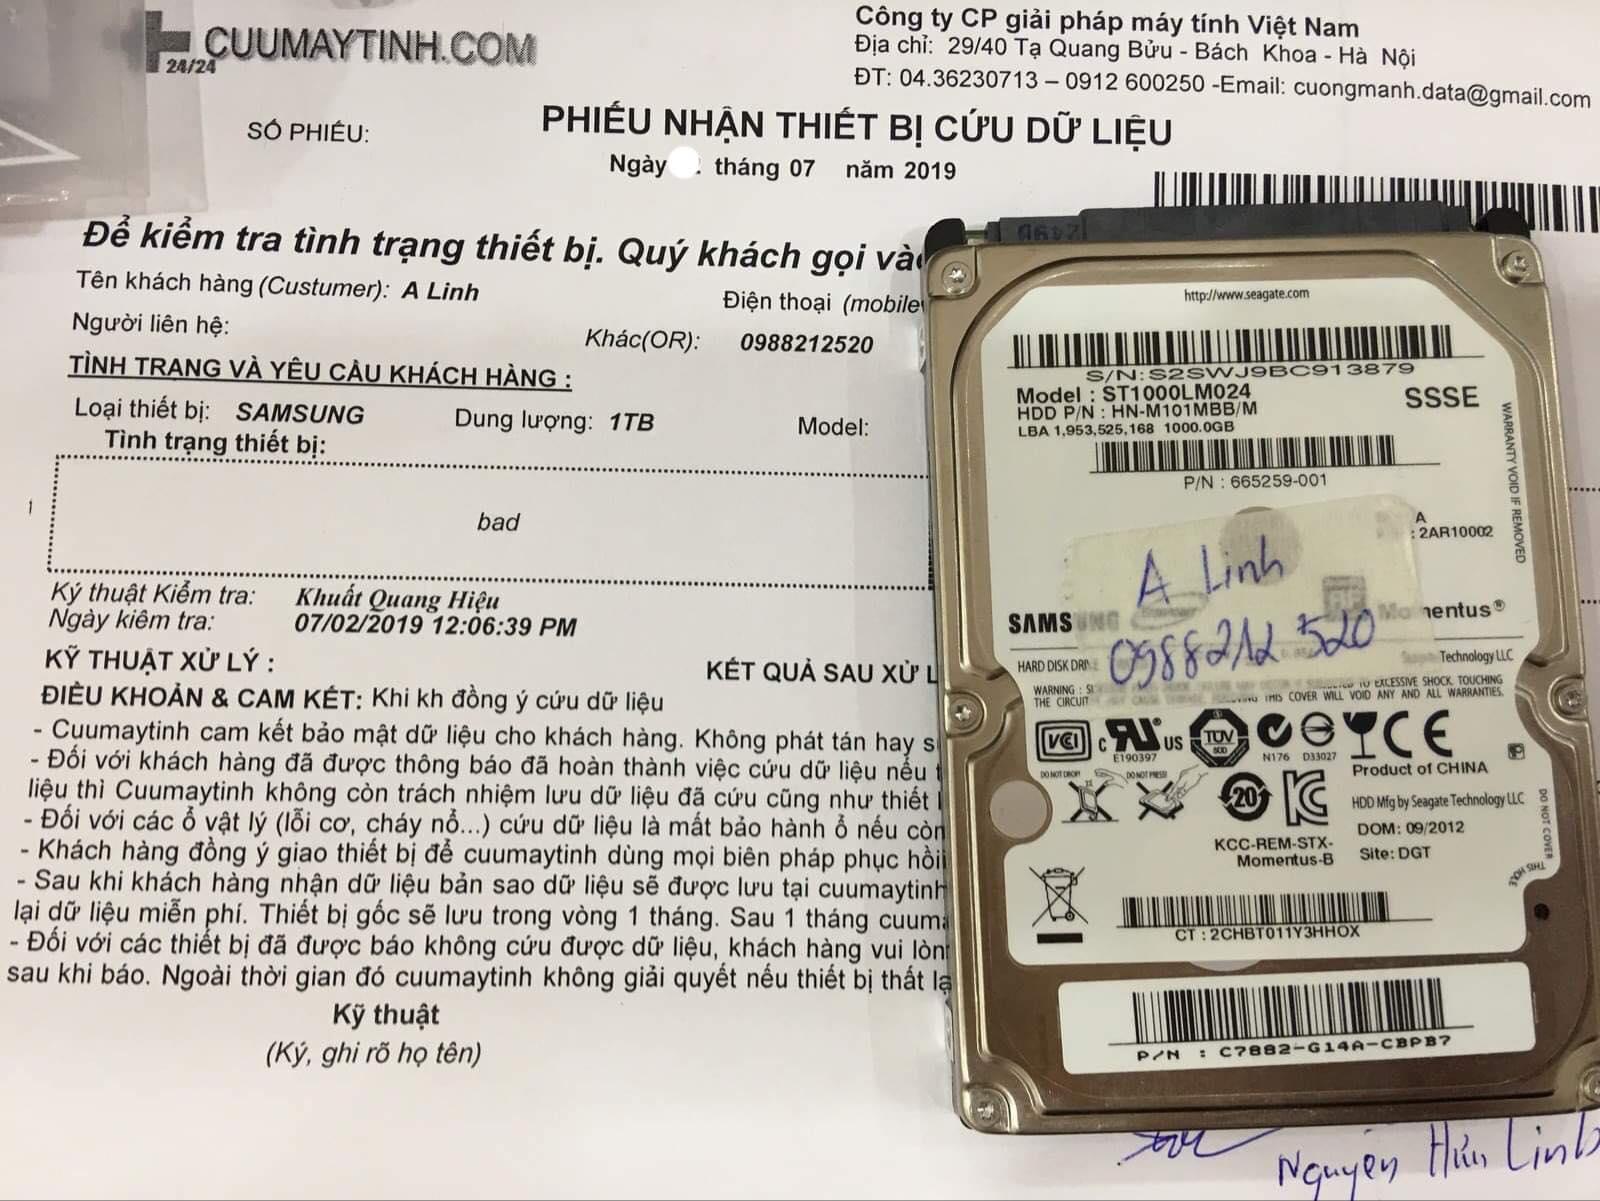 Cứu dữ liệu ổ cứng Samsung 1TB bad 18/07/2019 - cuumaytinh